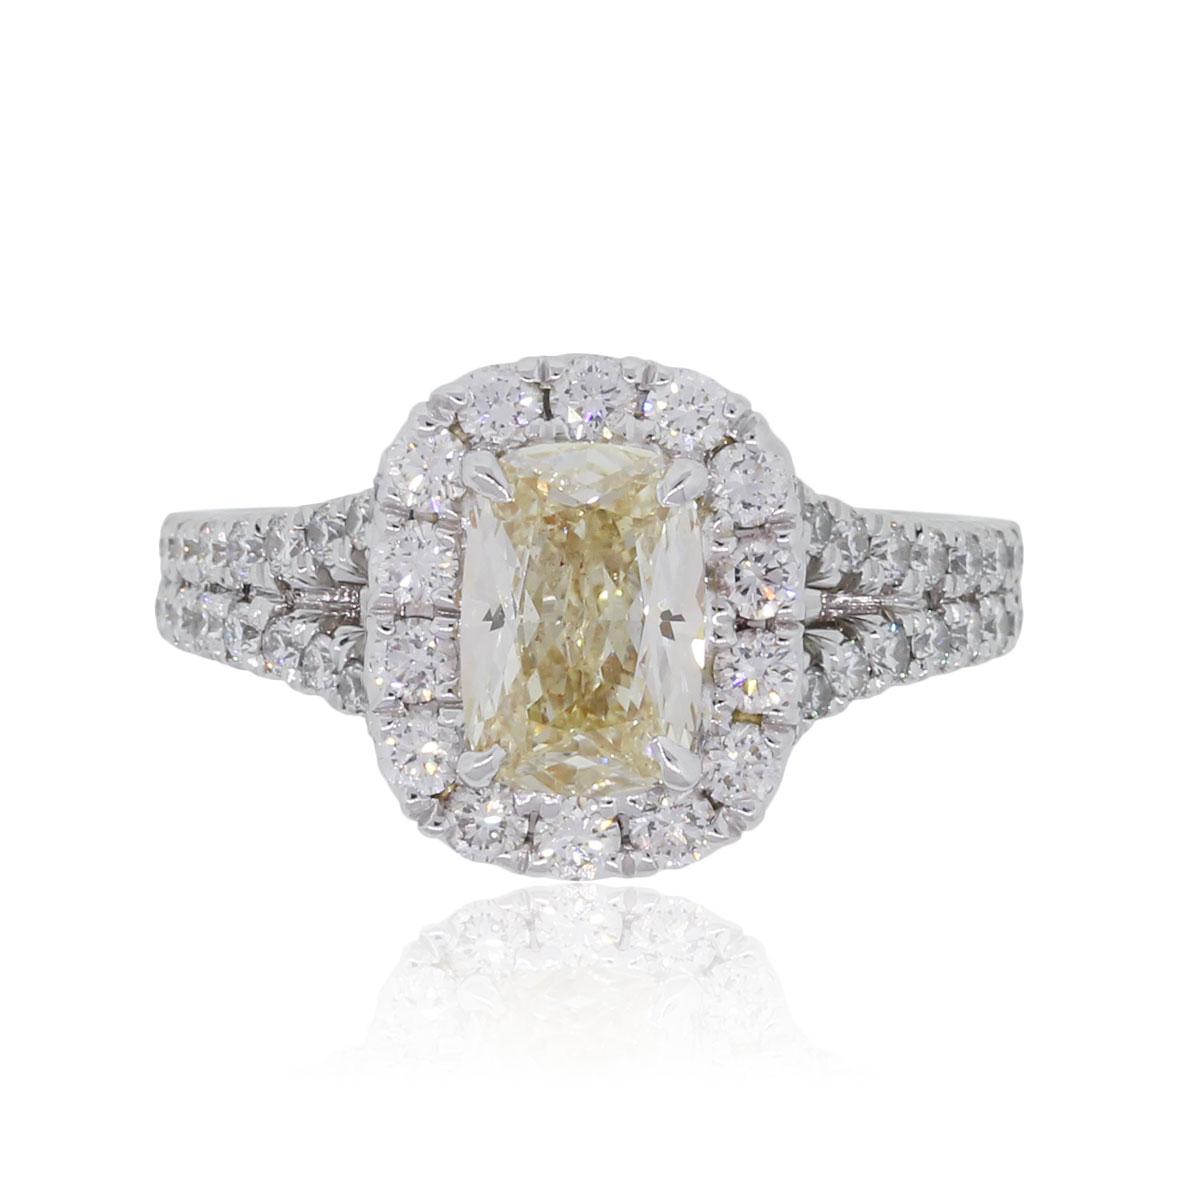 Henri Daussi AMDSY57 18k White Gold 1.13ct Fancy Yellow Cushion Cut Diamond Engagement Ring